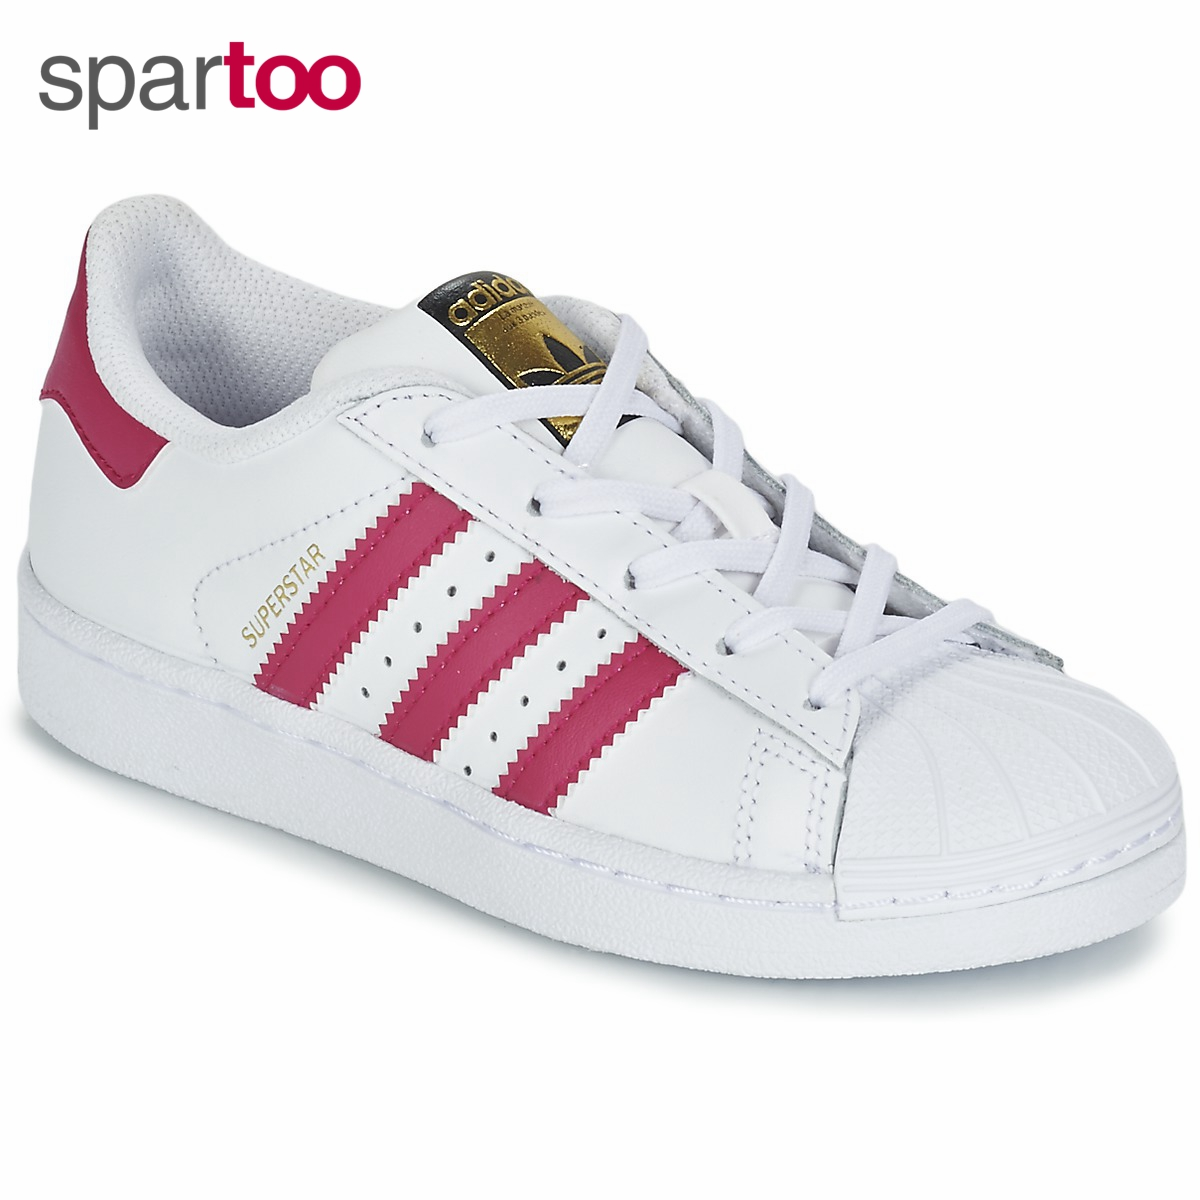 Adidas/阿迪达斯三叶草SUPERSTAR 女金标贝壳头运动休闲板鞋